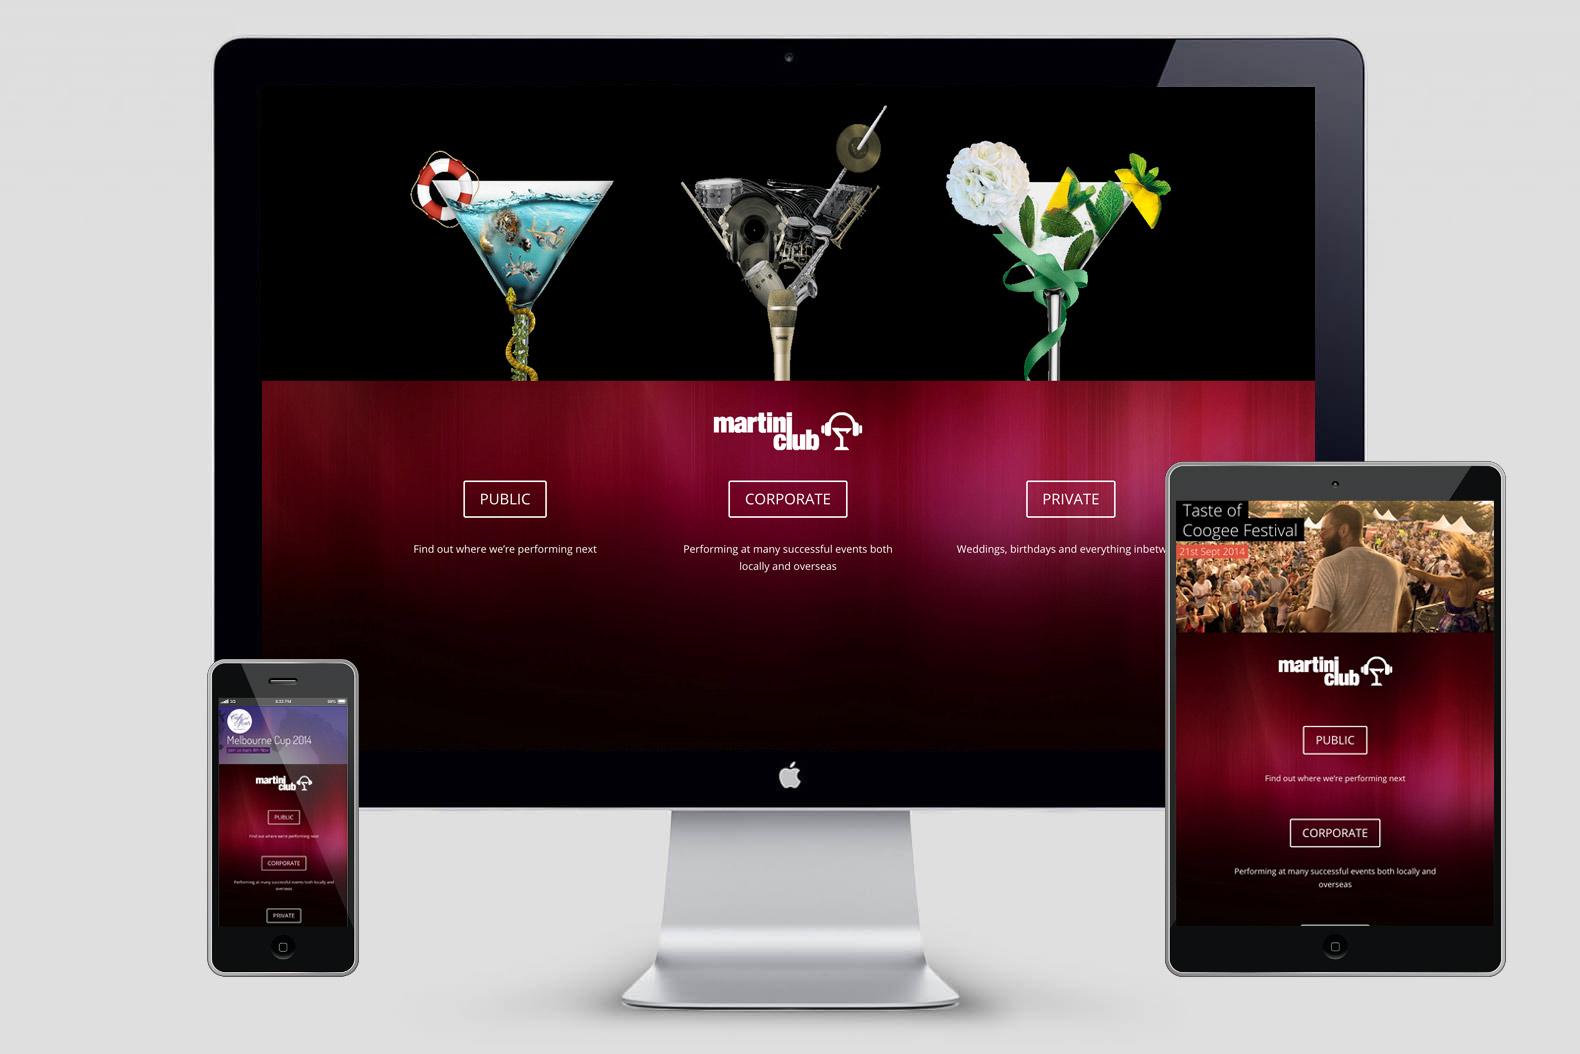 Martini Club website